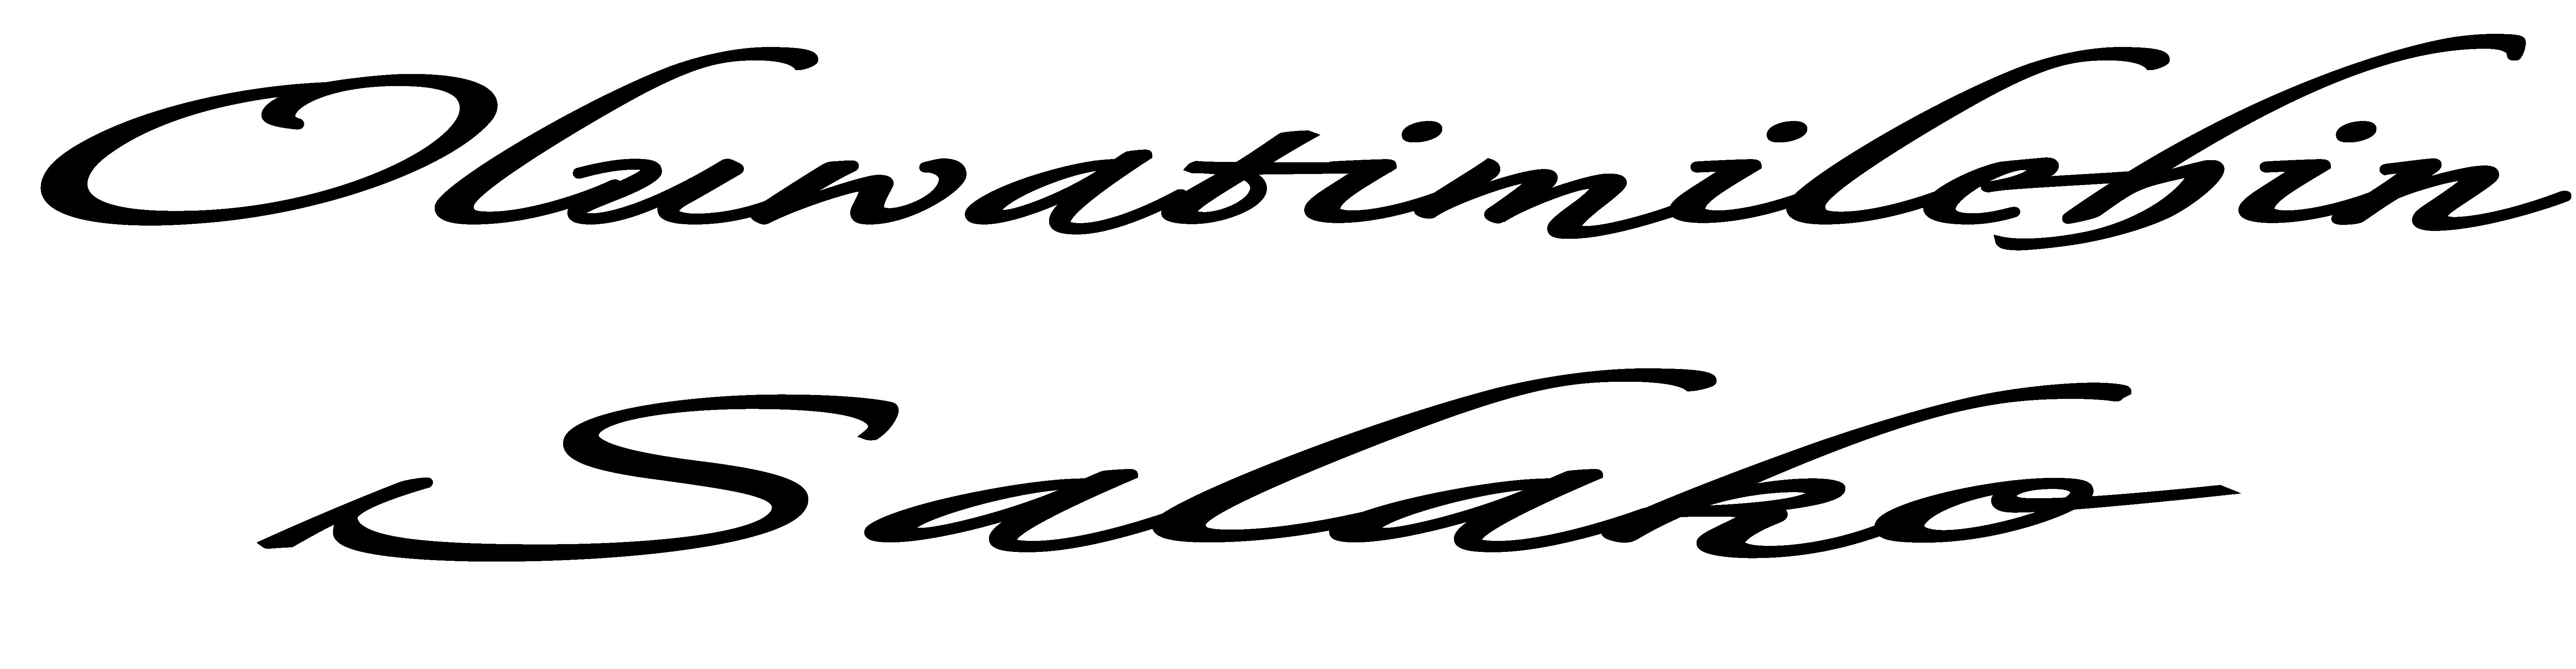 Oluwatimilehin Salako Signature